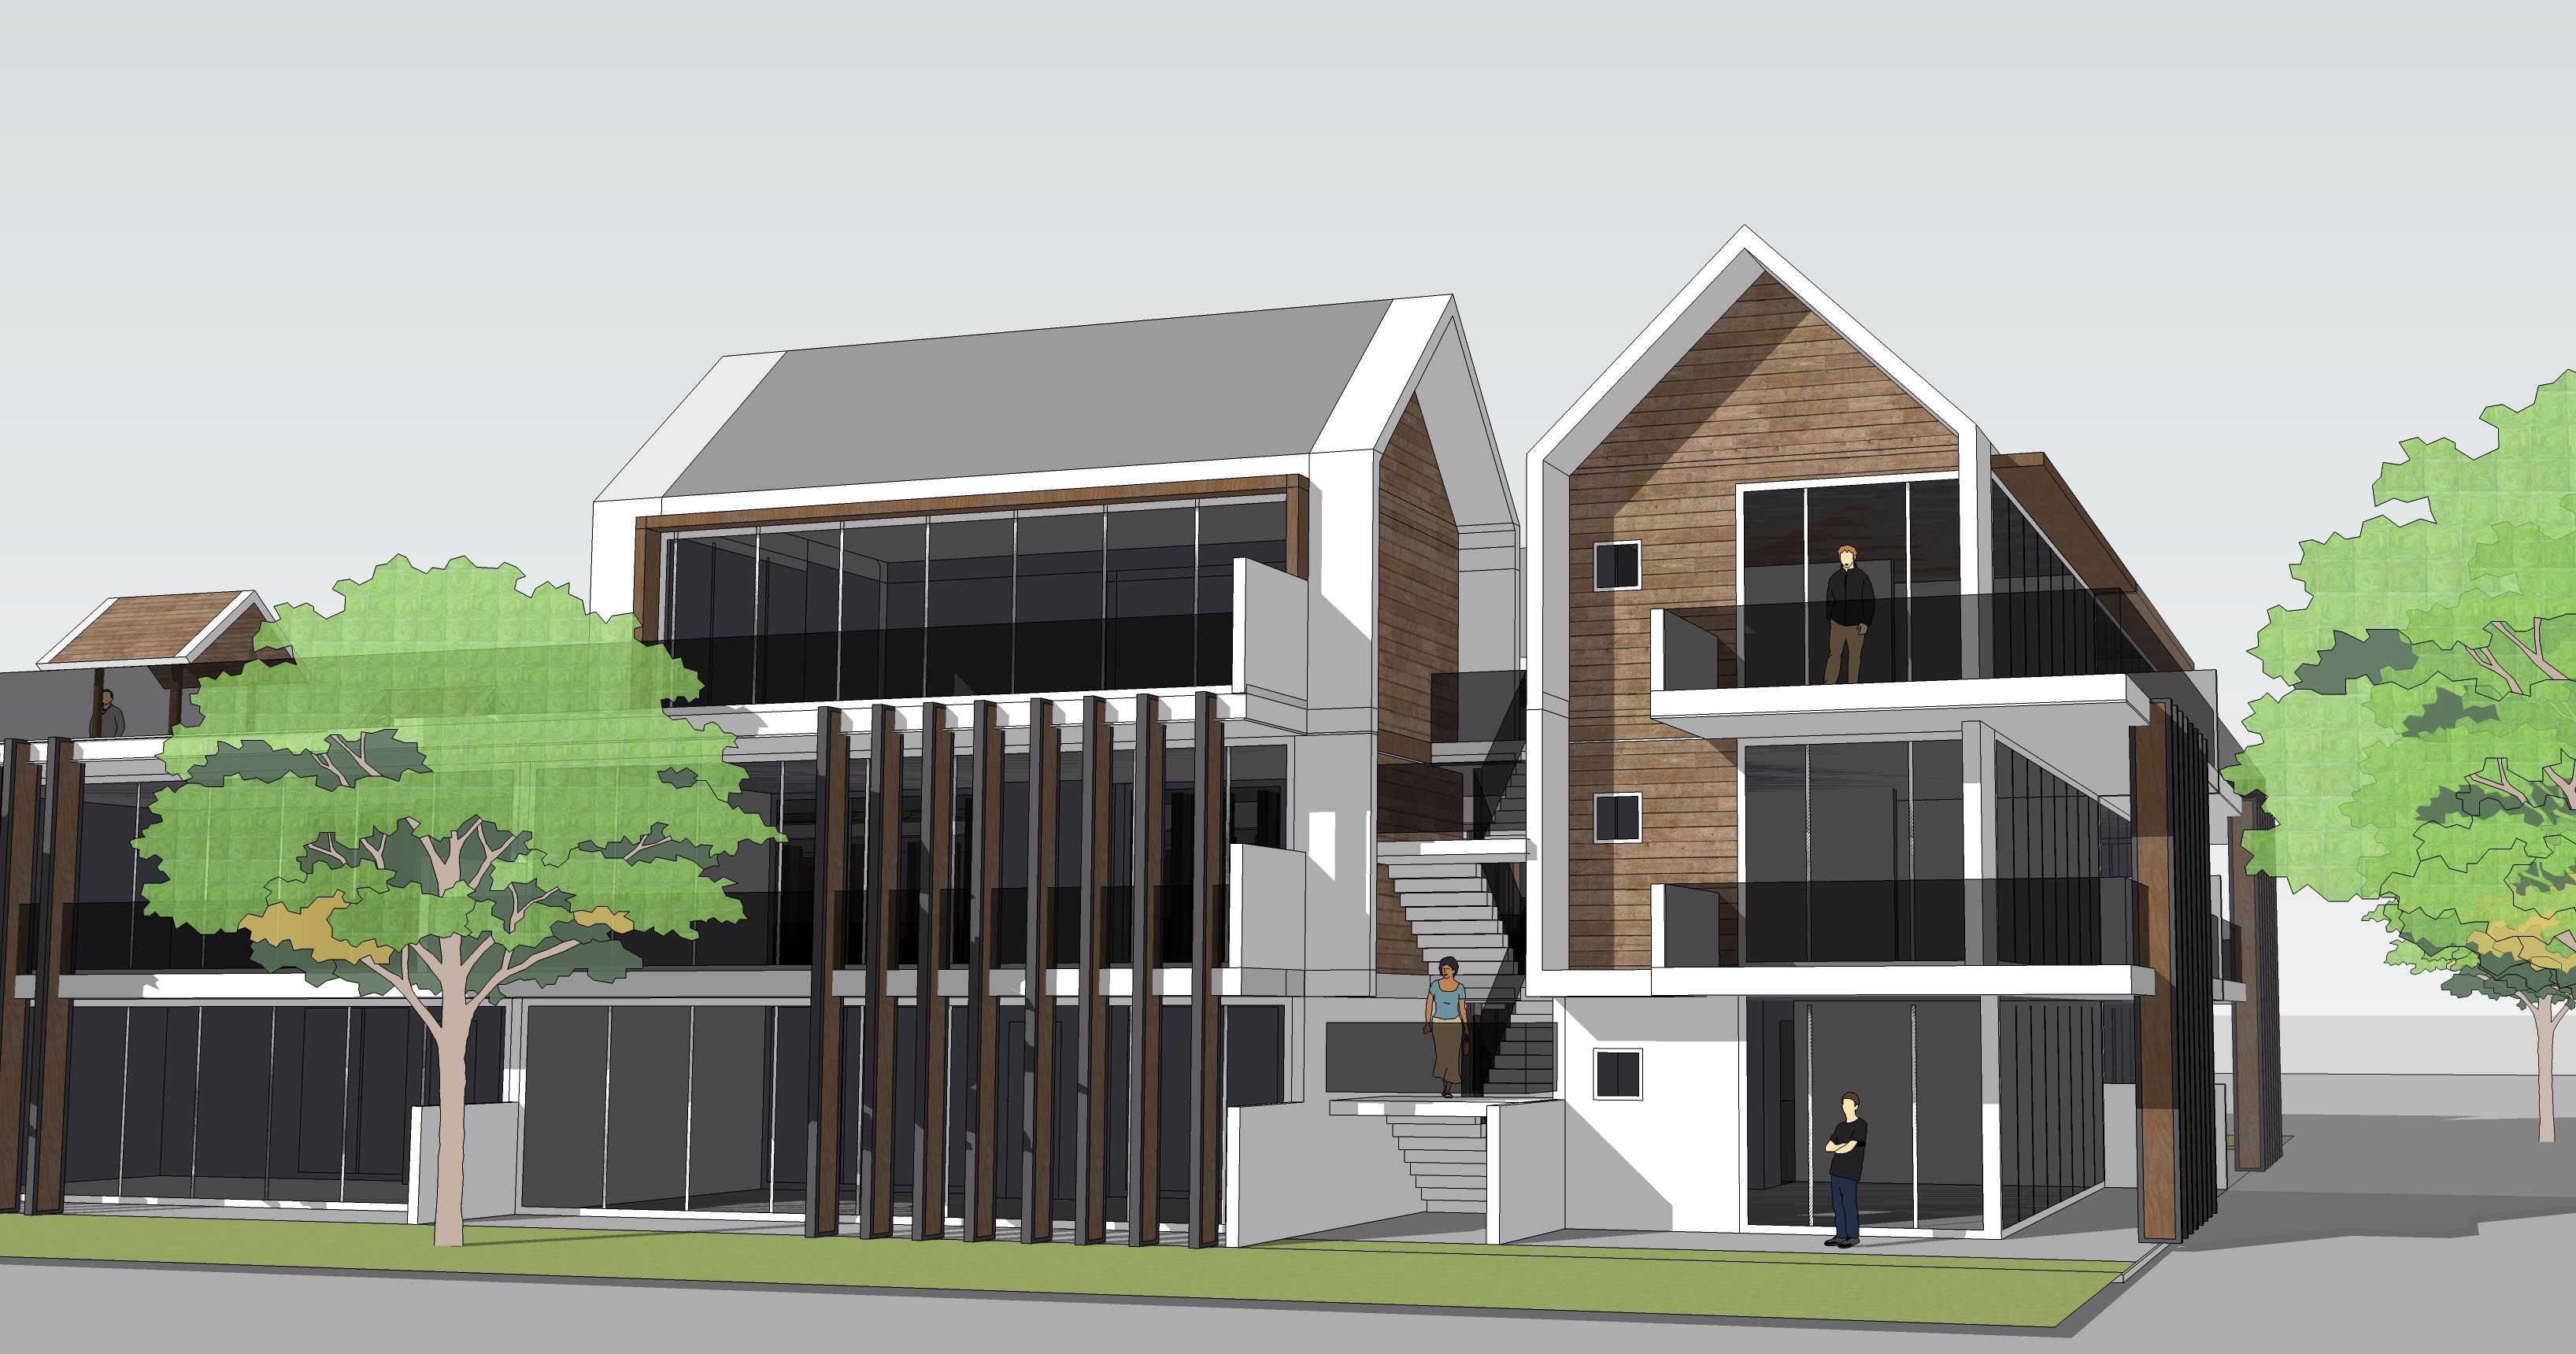 Modern Architecture Apartment Sketchup Modelling Landscape Design